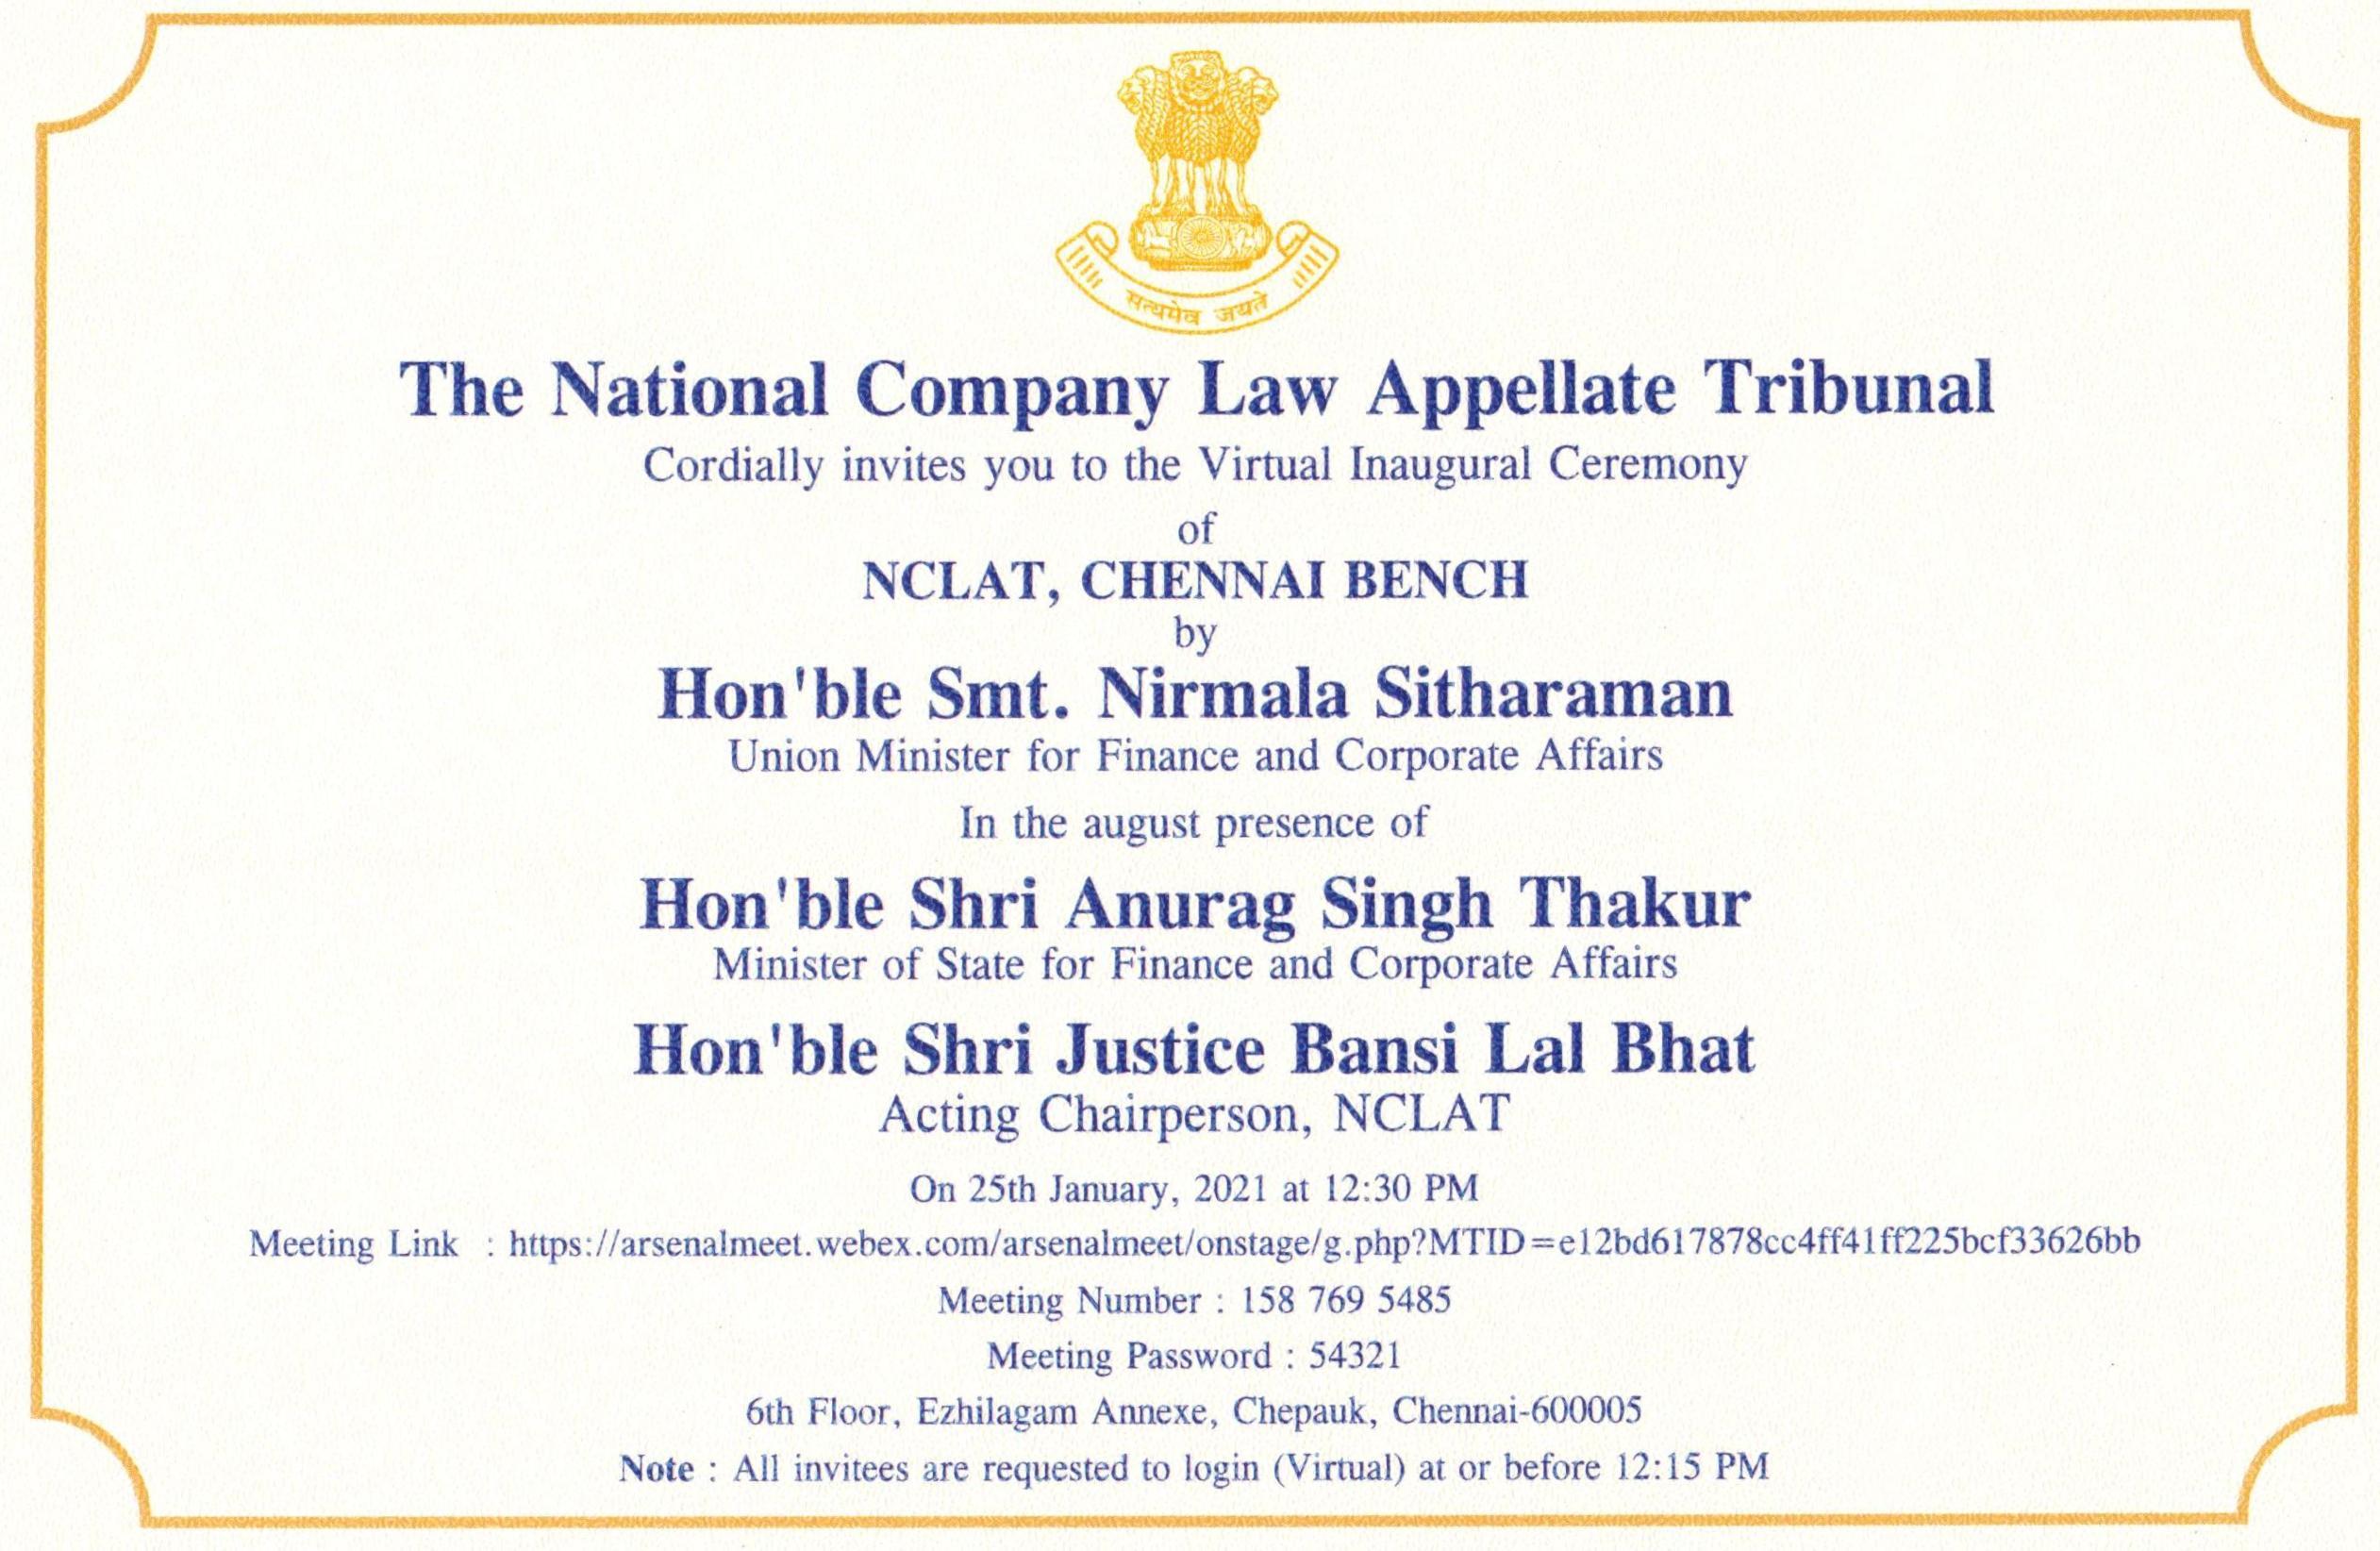 Inauguration Of NCLAT, Chennai Bench By Union Minister Smt. Nirmala Sitharaman [25th January 2021]